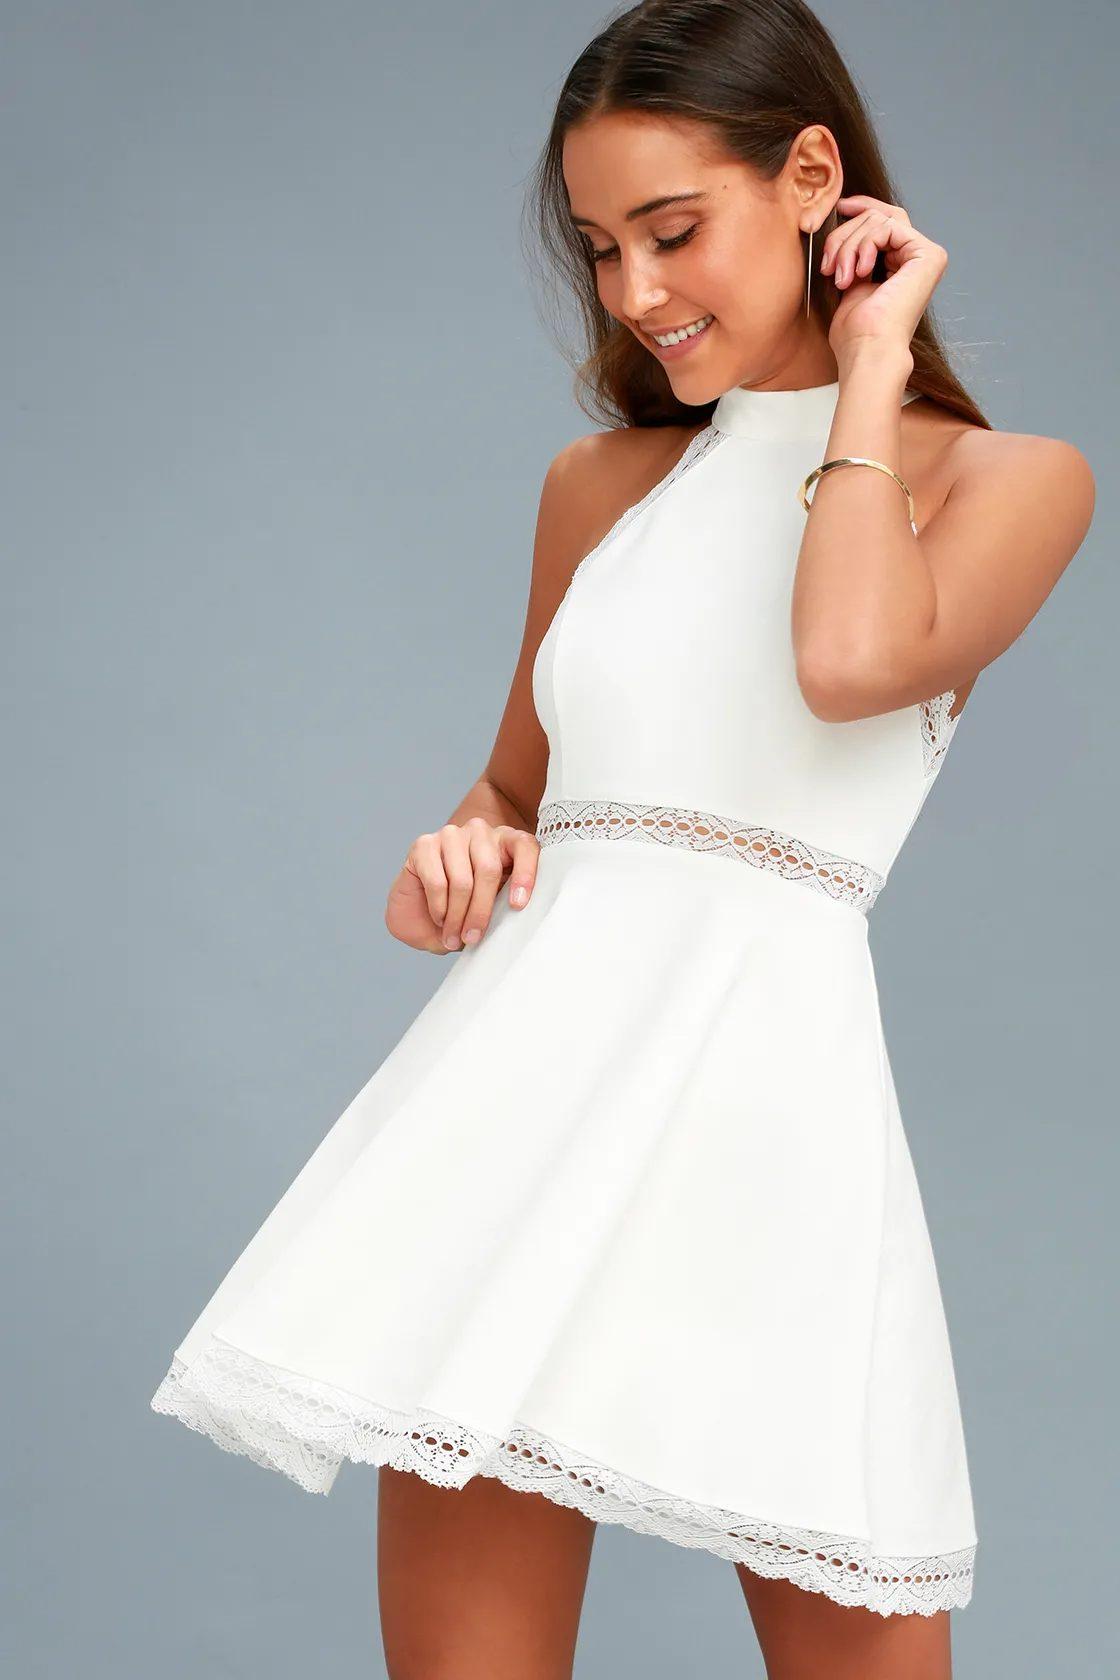 White A-line mini dress